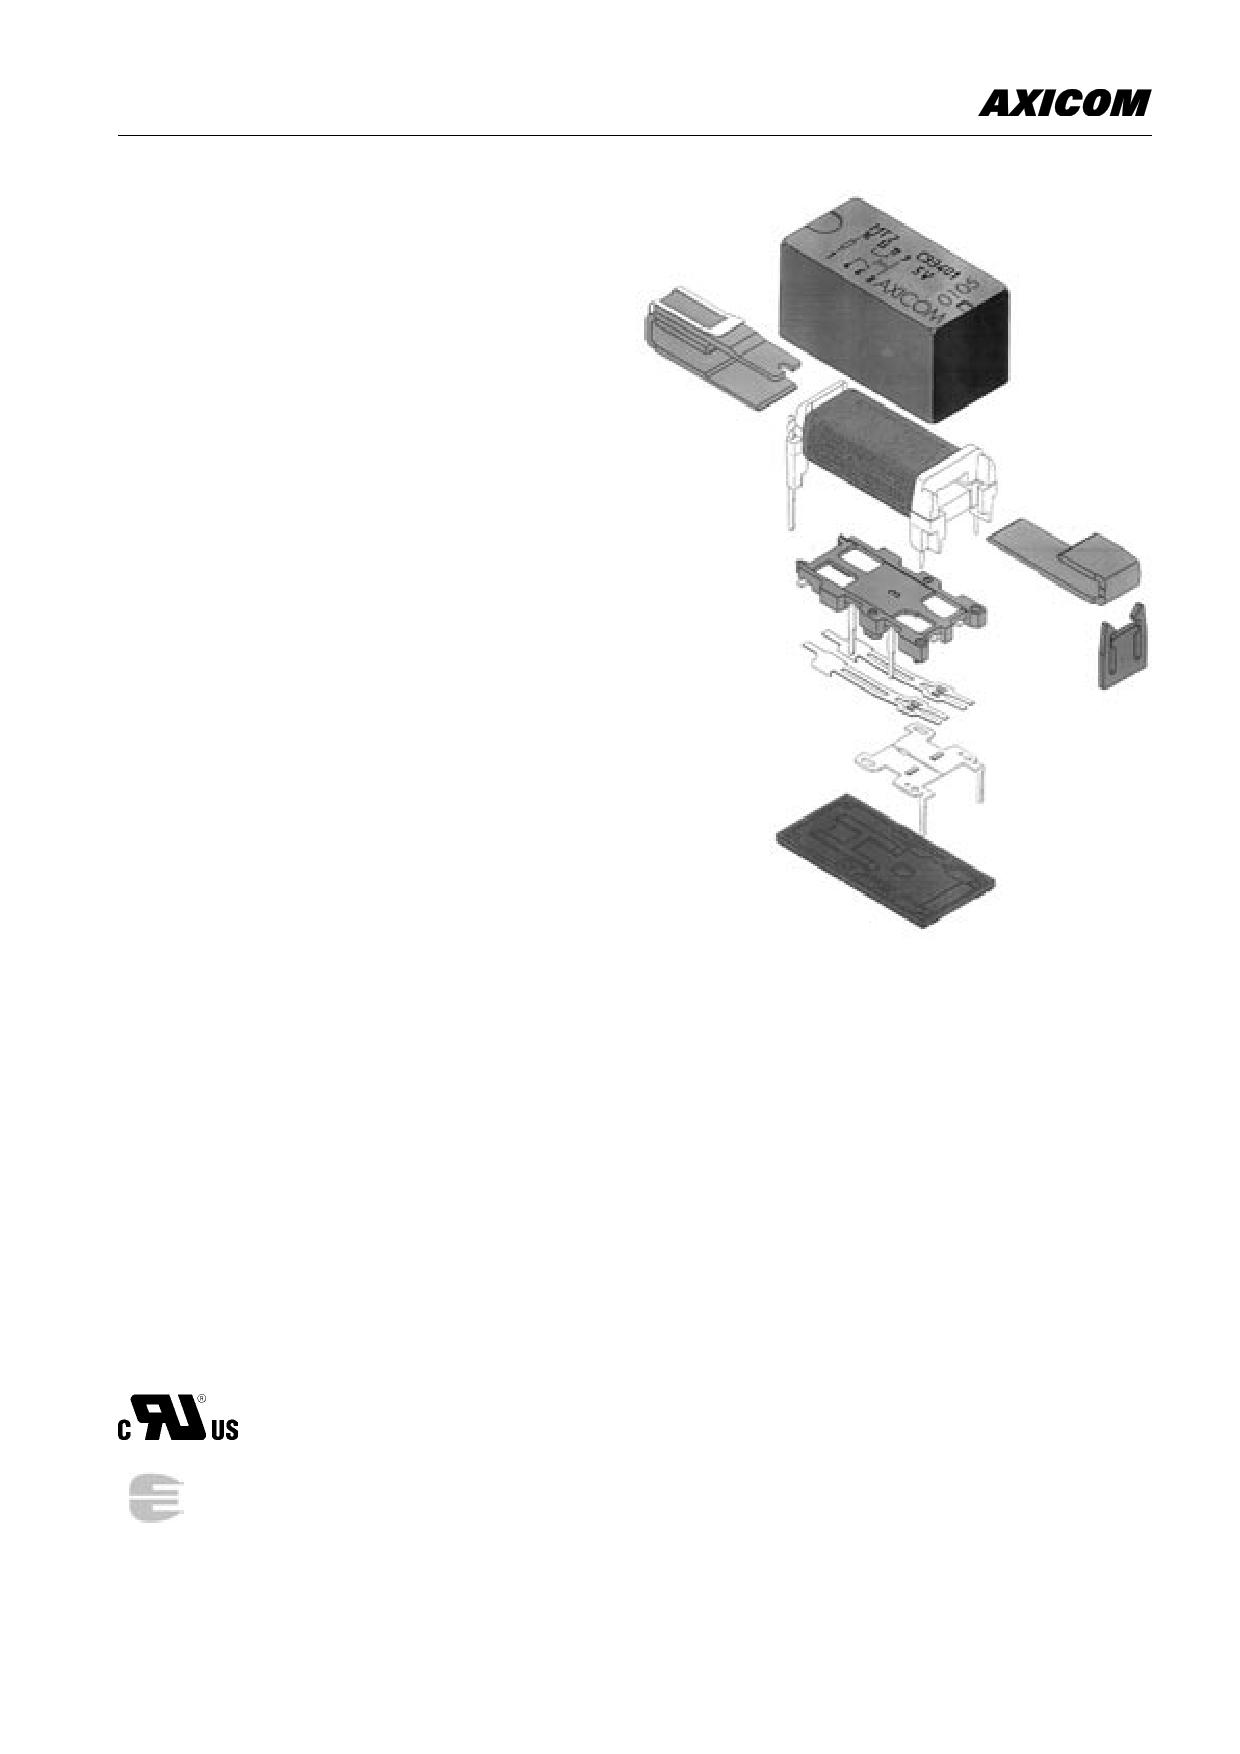 1-1462001-2 Даташит, Описание, Даташиты